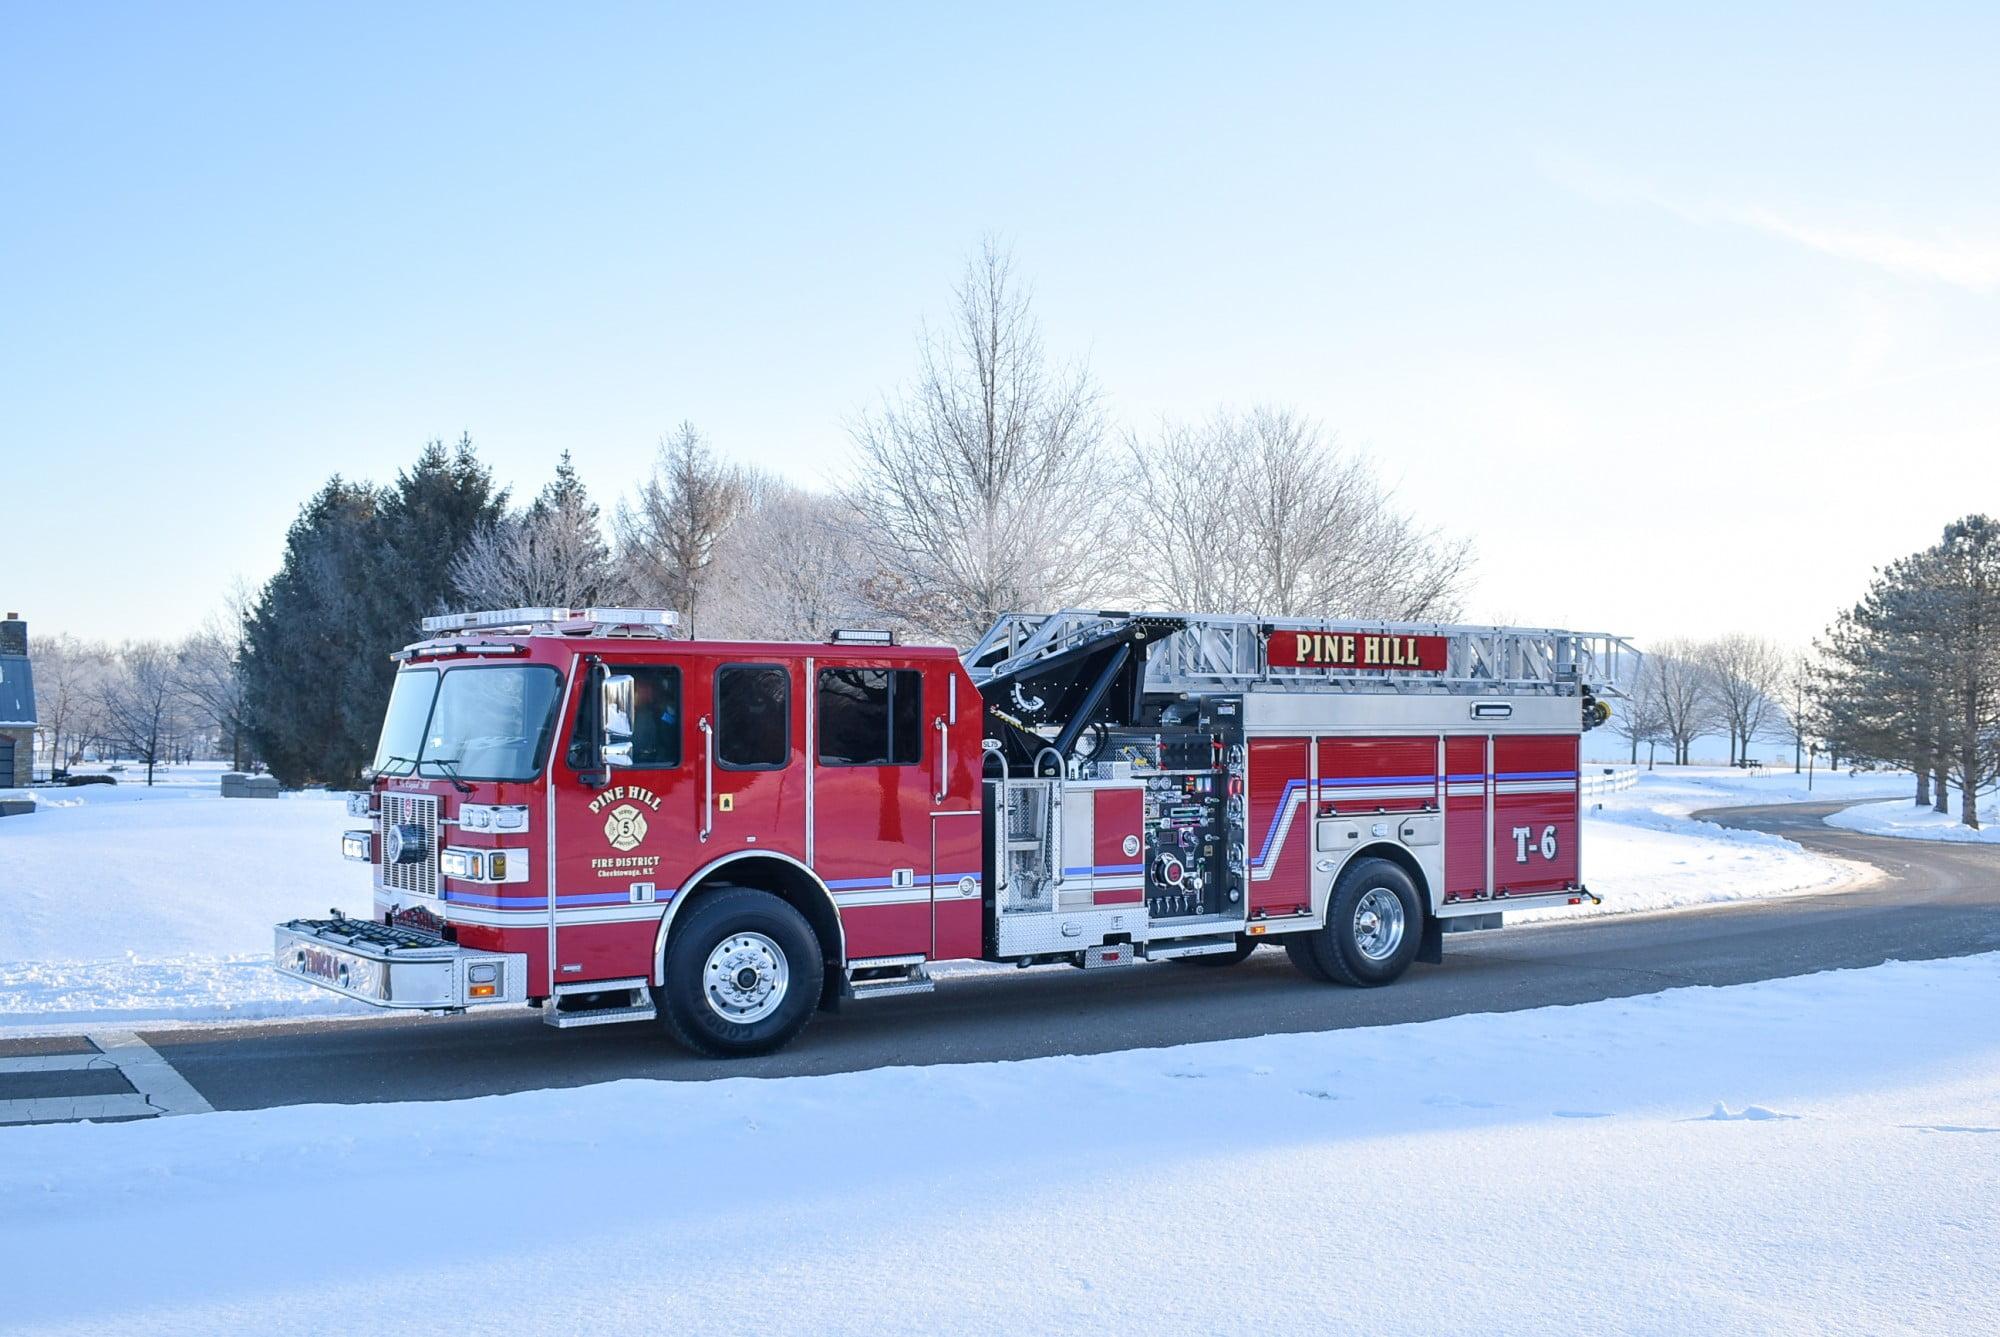 Pine Hill Fire District